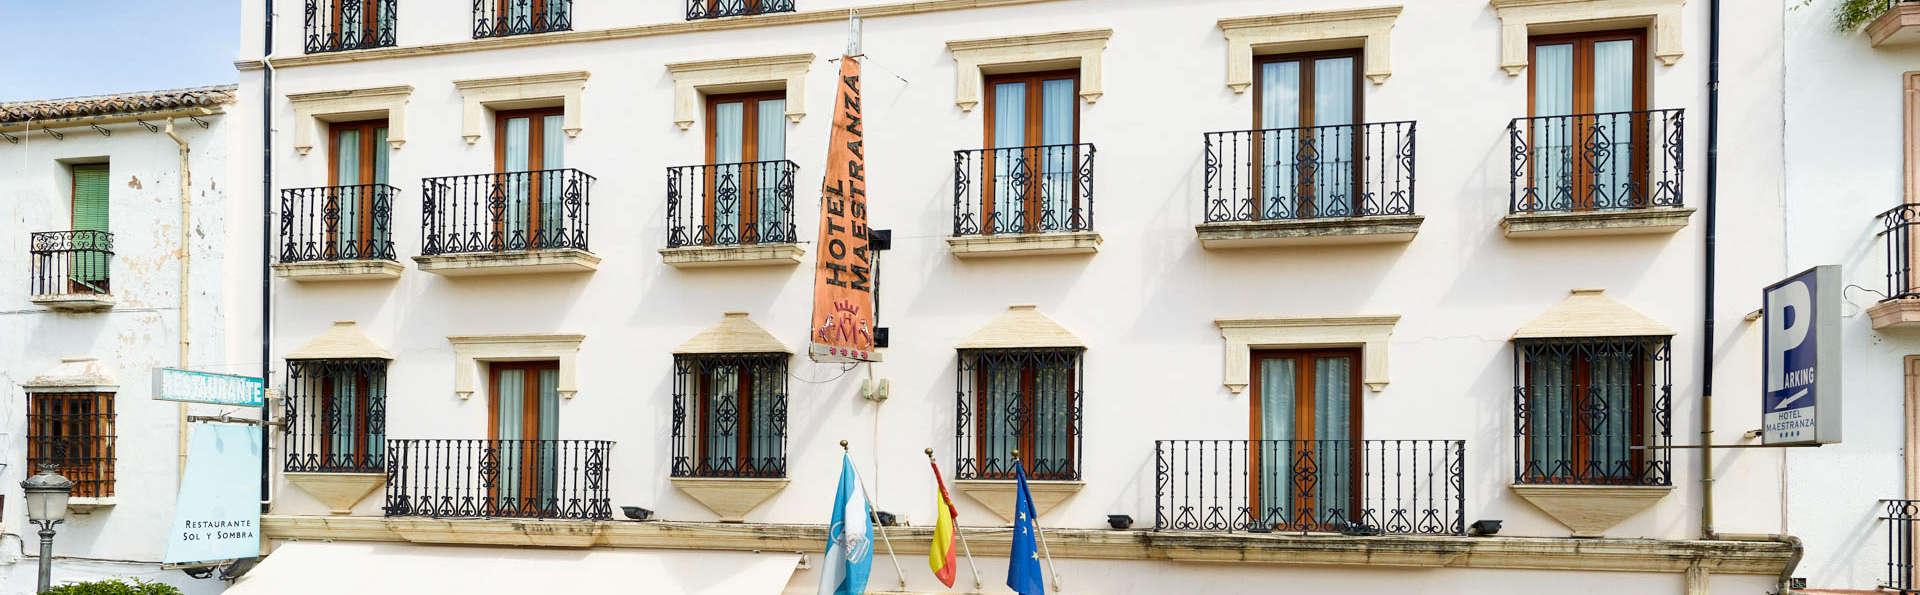 Hotel Maestranza Ronda - EDIT_FRONT.jpg